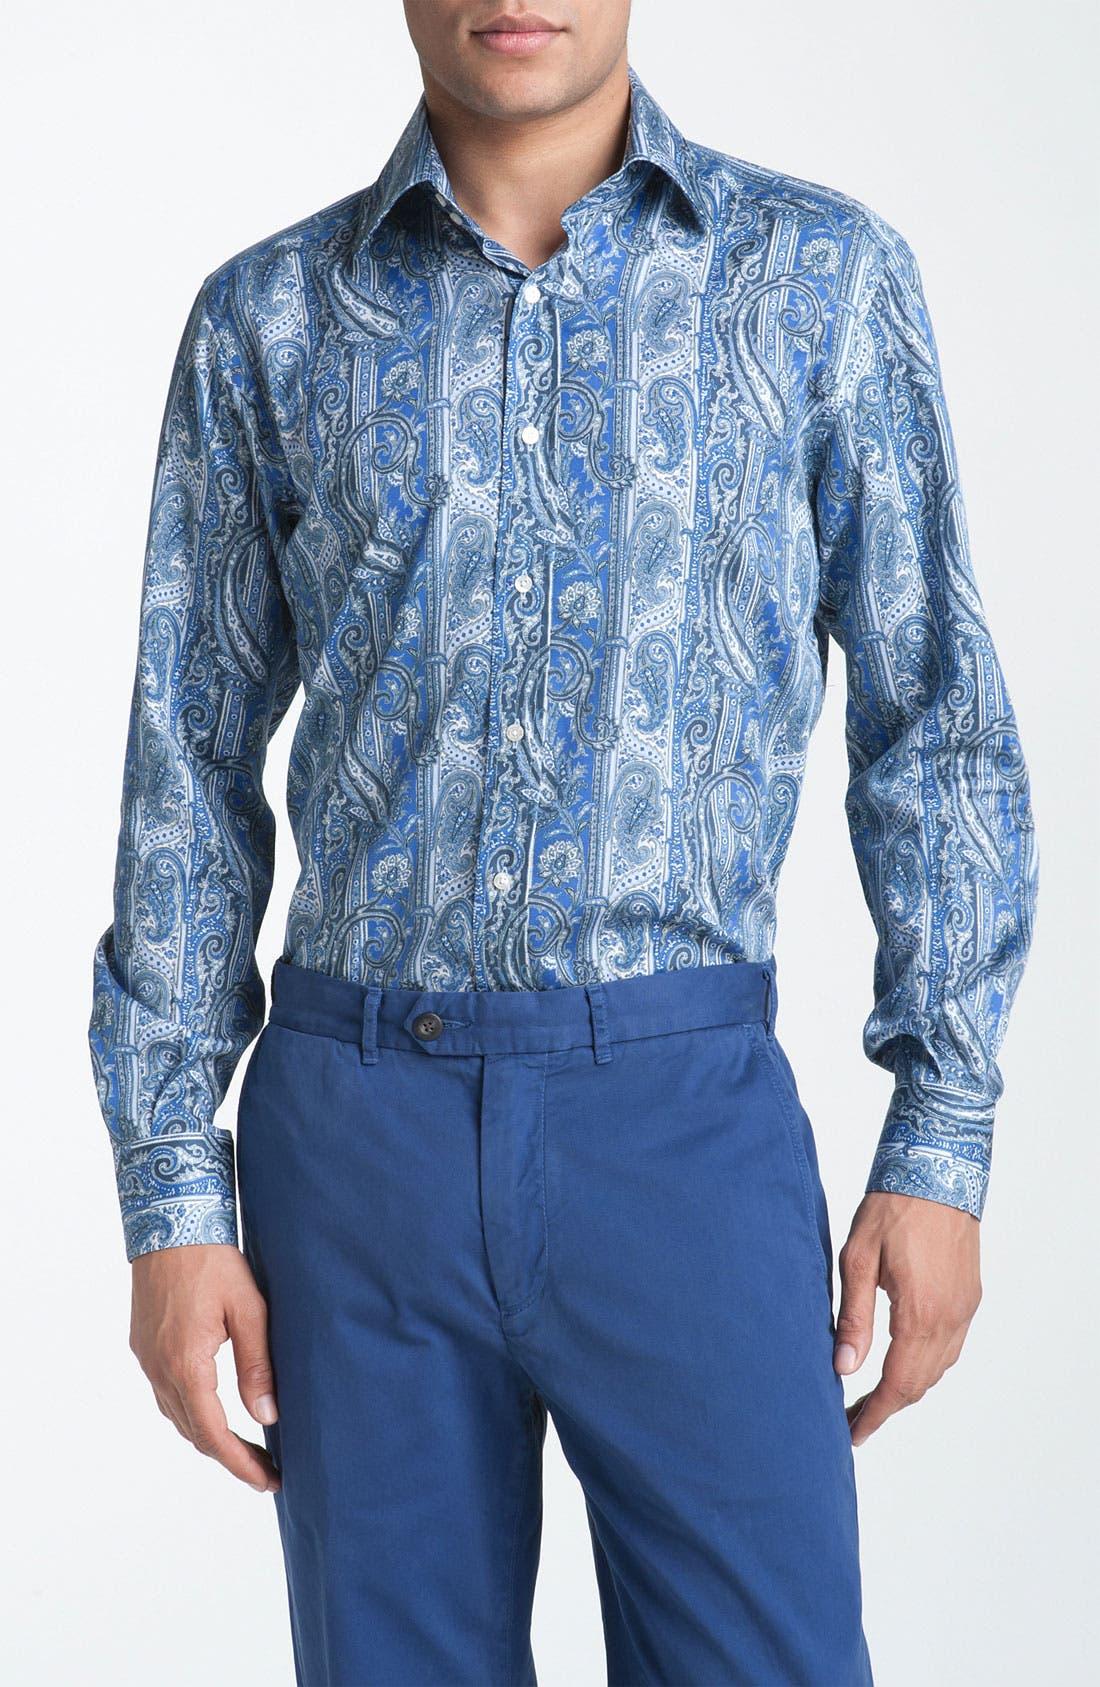 Alternate Image 1 Selected - Etro Paisley Woven Dress Shirt